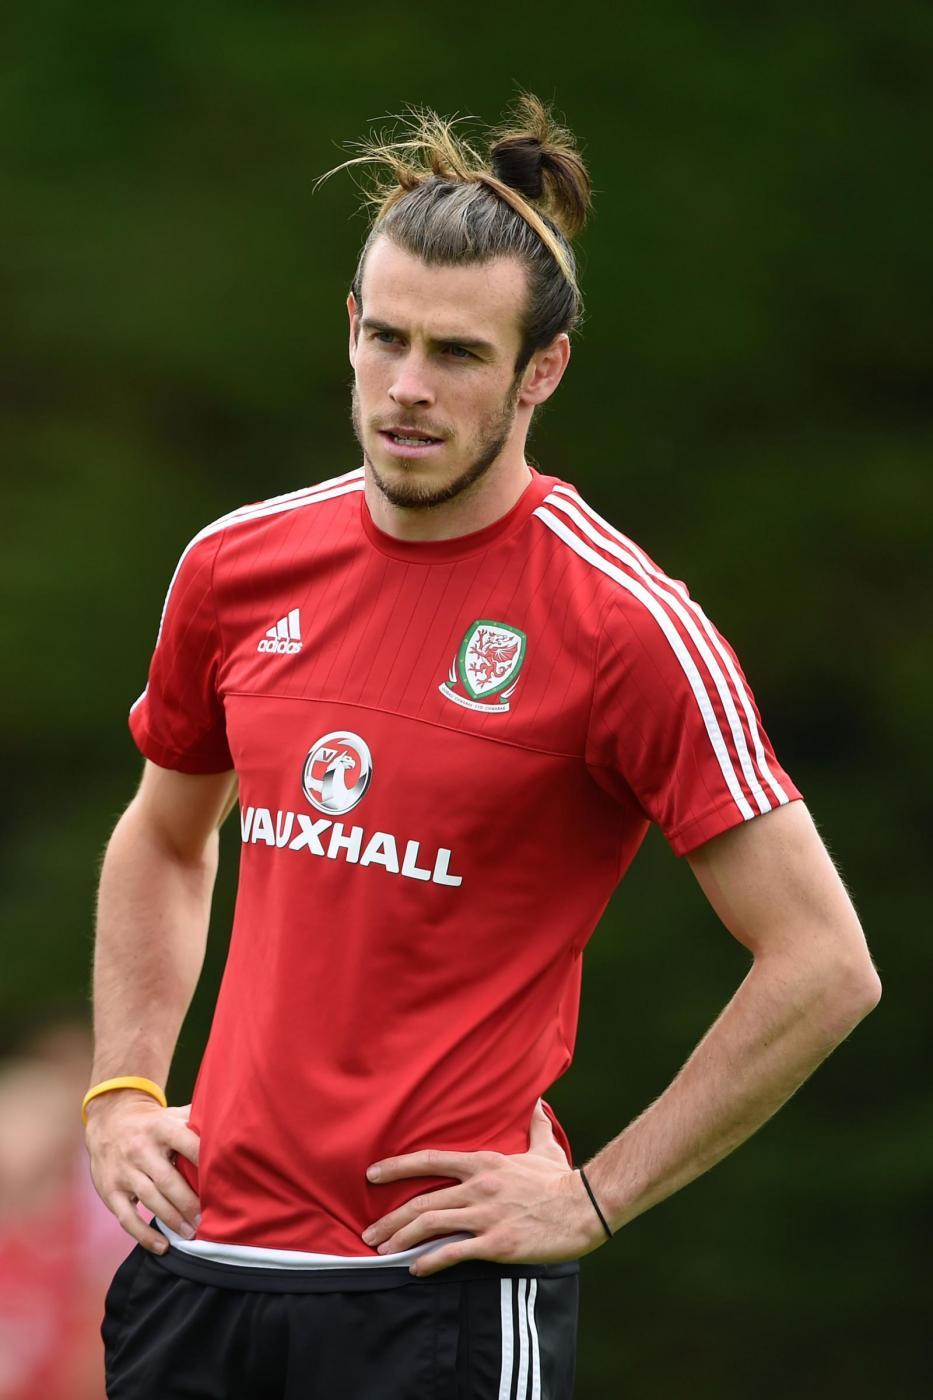 Gareth Bale (Real Madrid) - Adidas - 4,6 milioni annui - LaPresse/PA